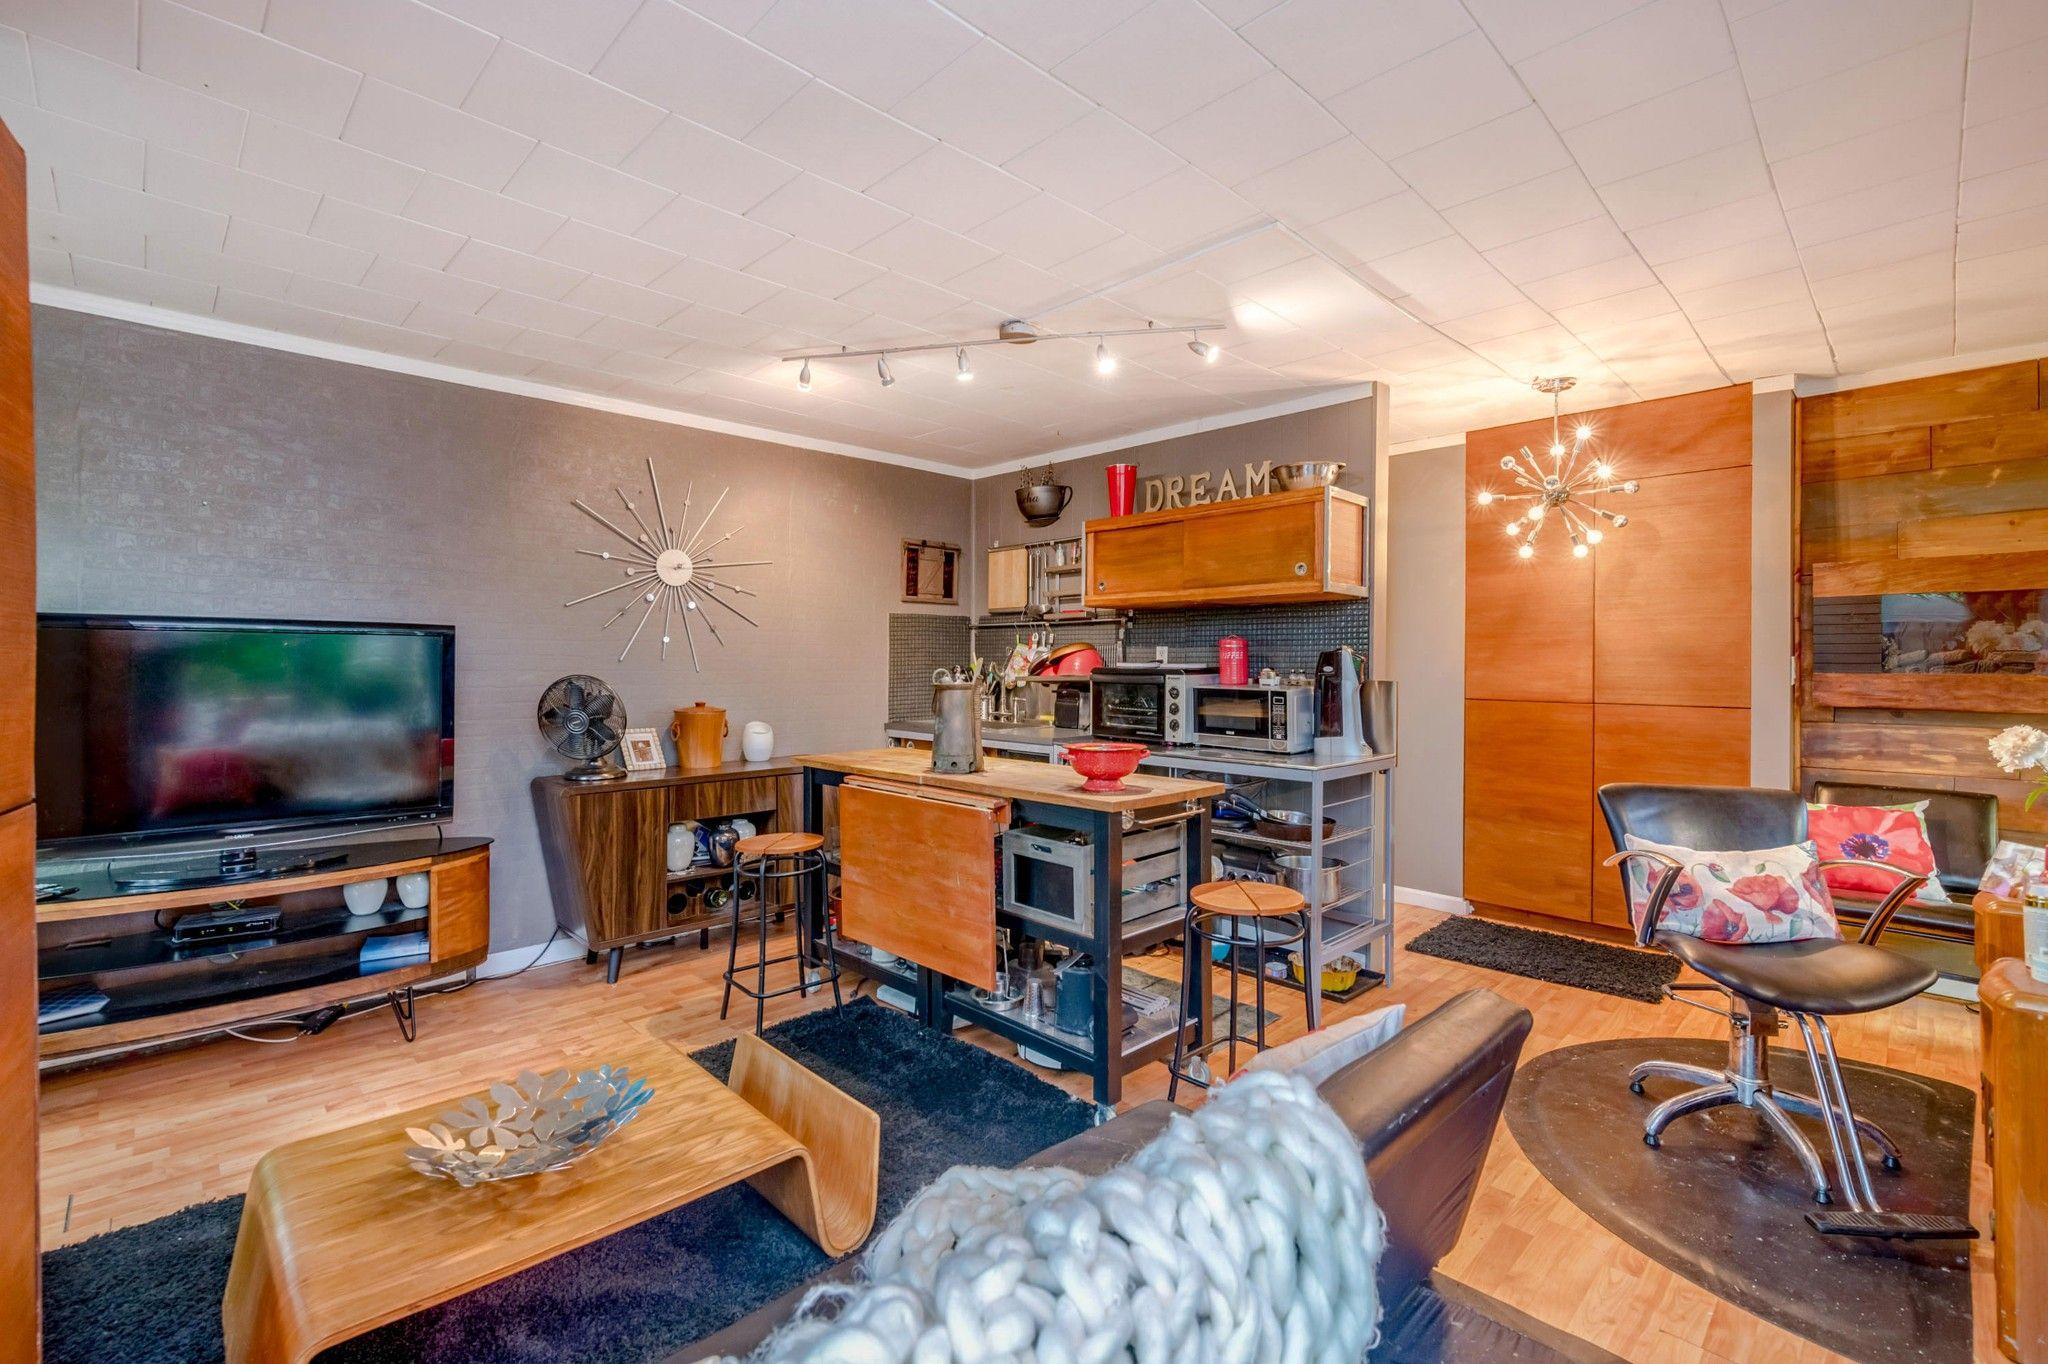 Photo 17: Photos: 20623 114 Avenue in Maple Ridge: Southwest Maple Ridge House for sale : MLS®# R2465656